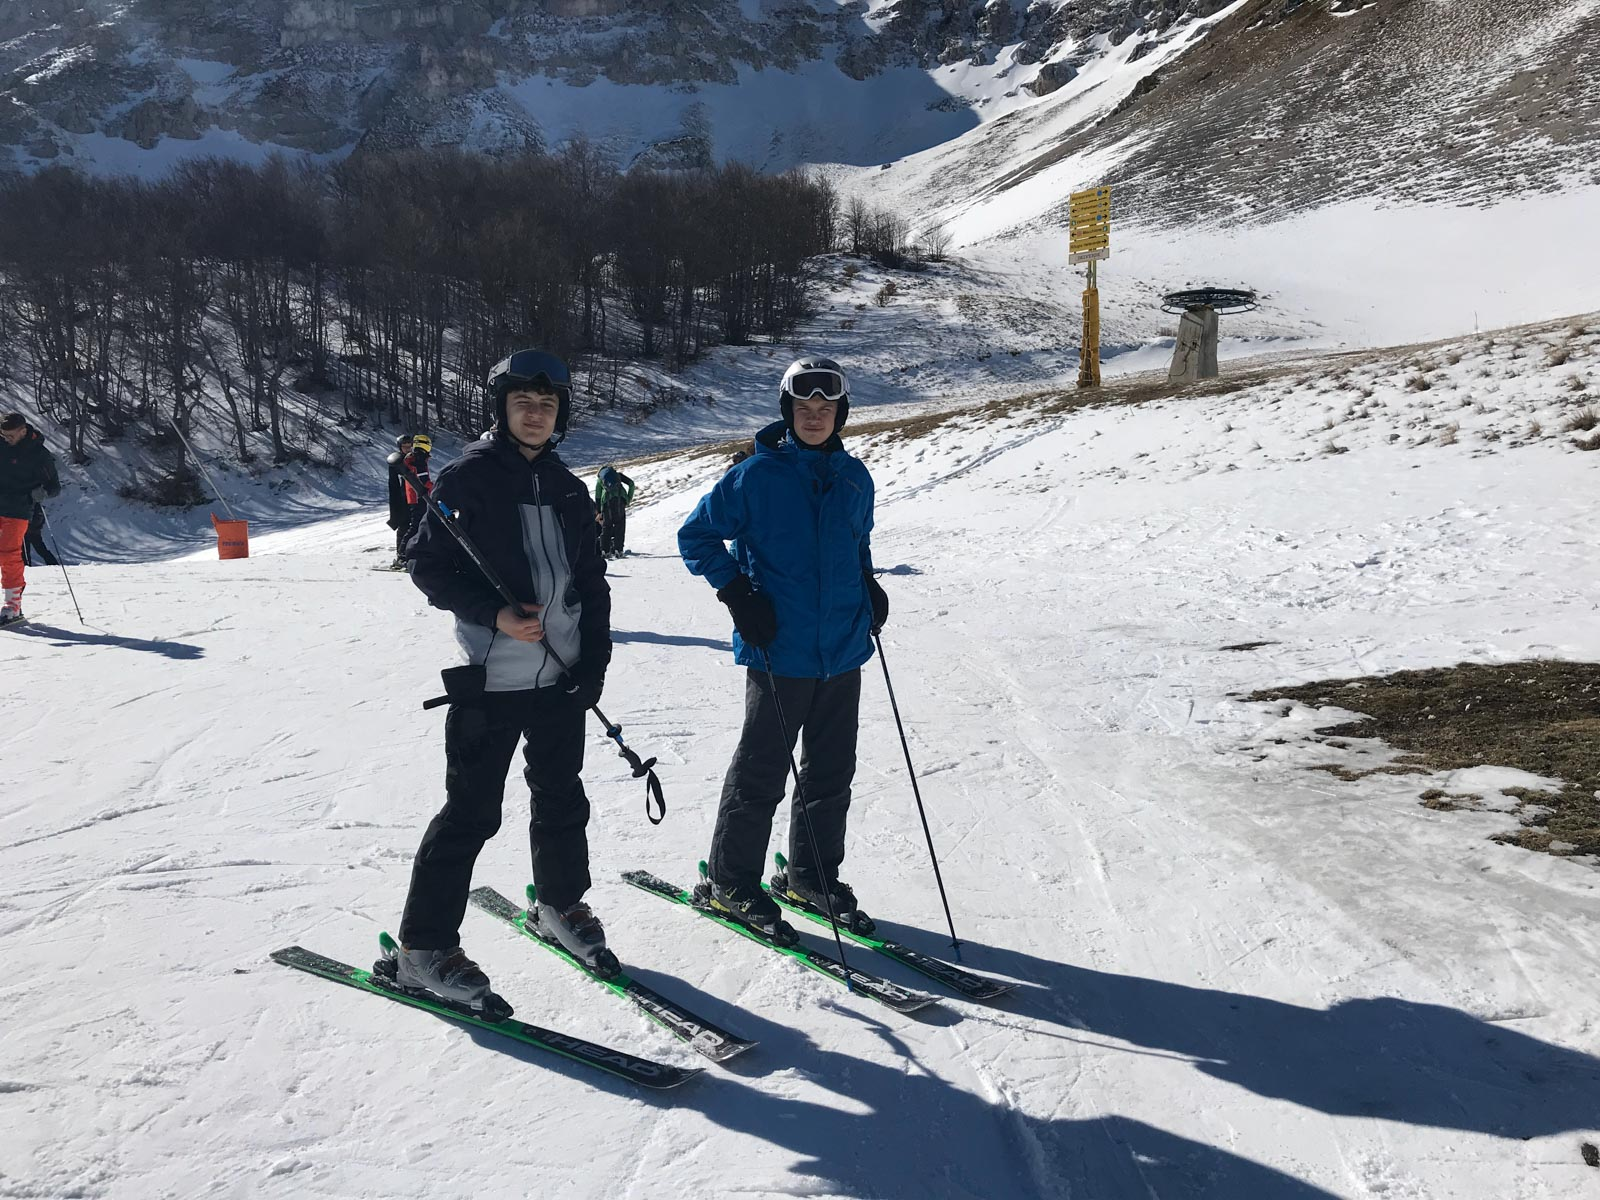 Roccaraso: 110km of skiing across 70 slopes